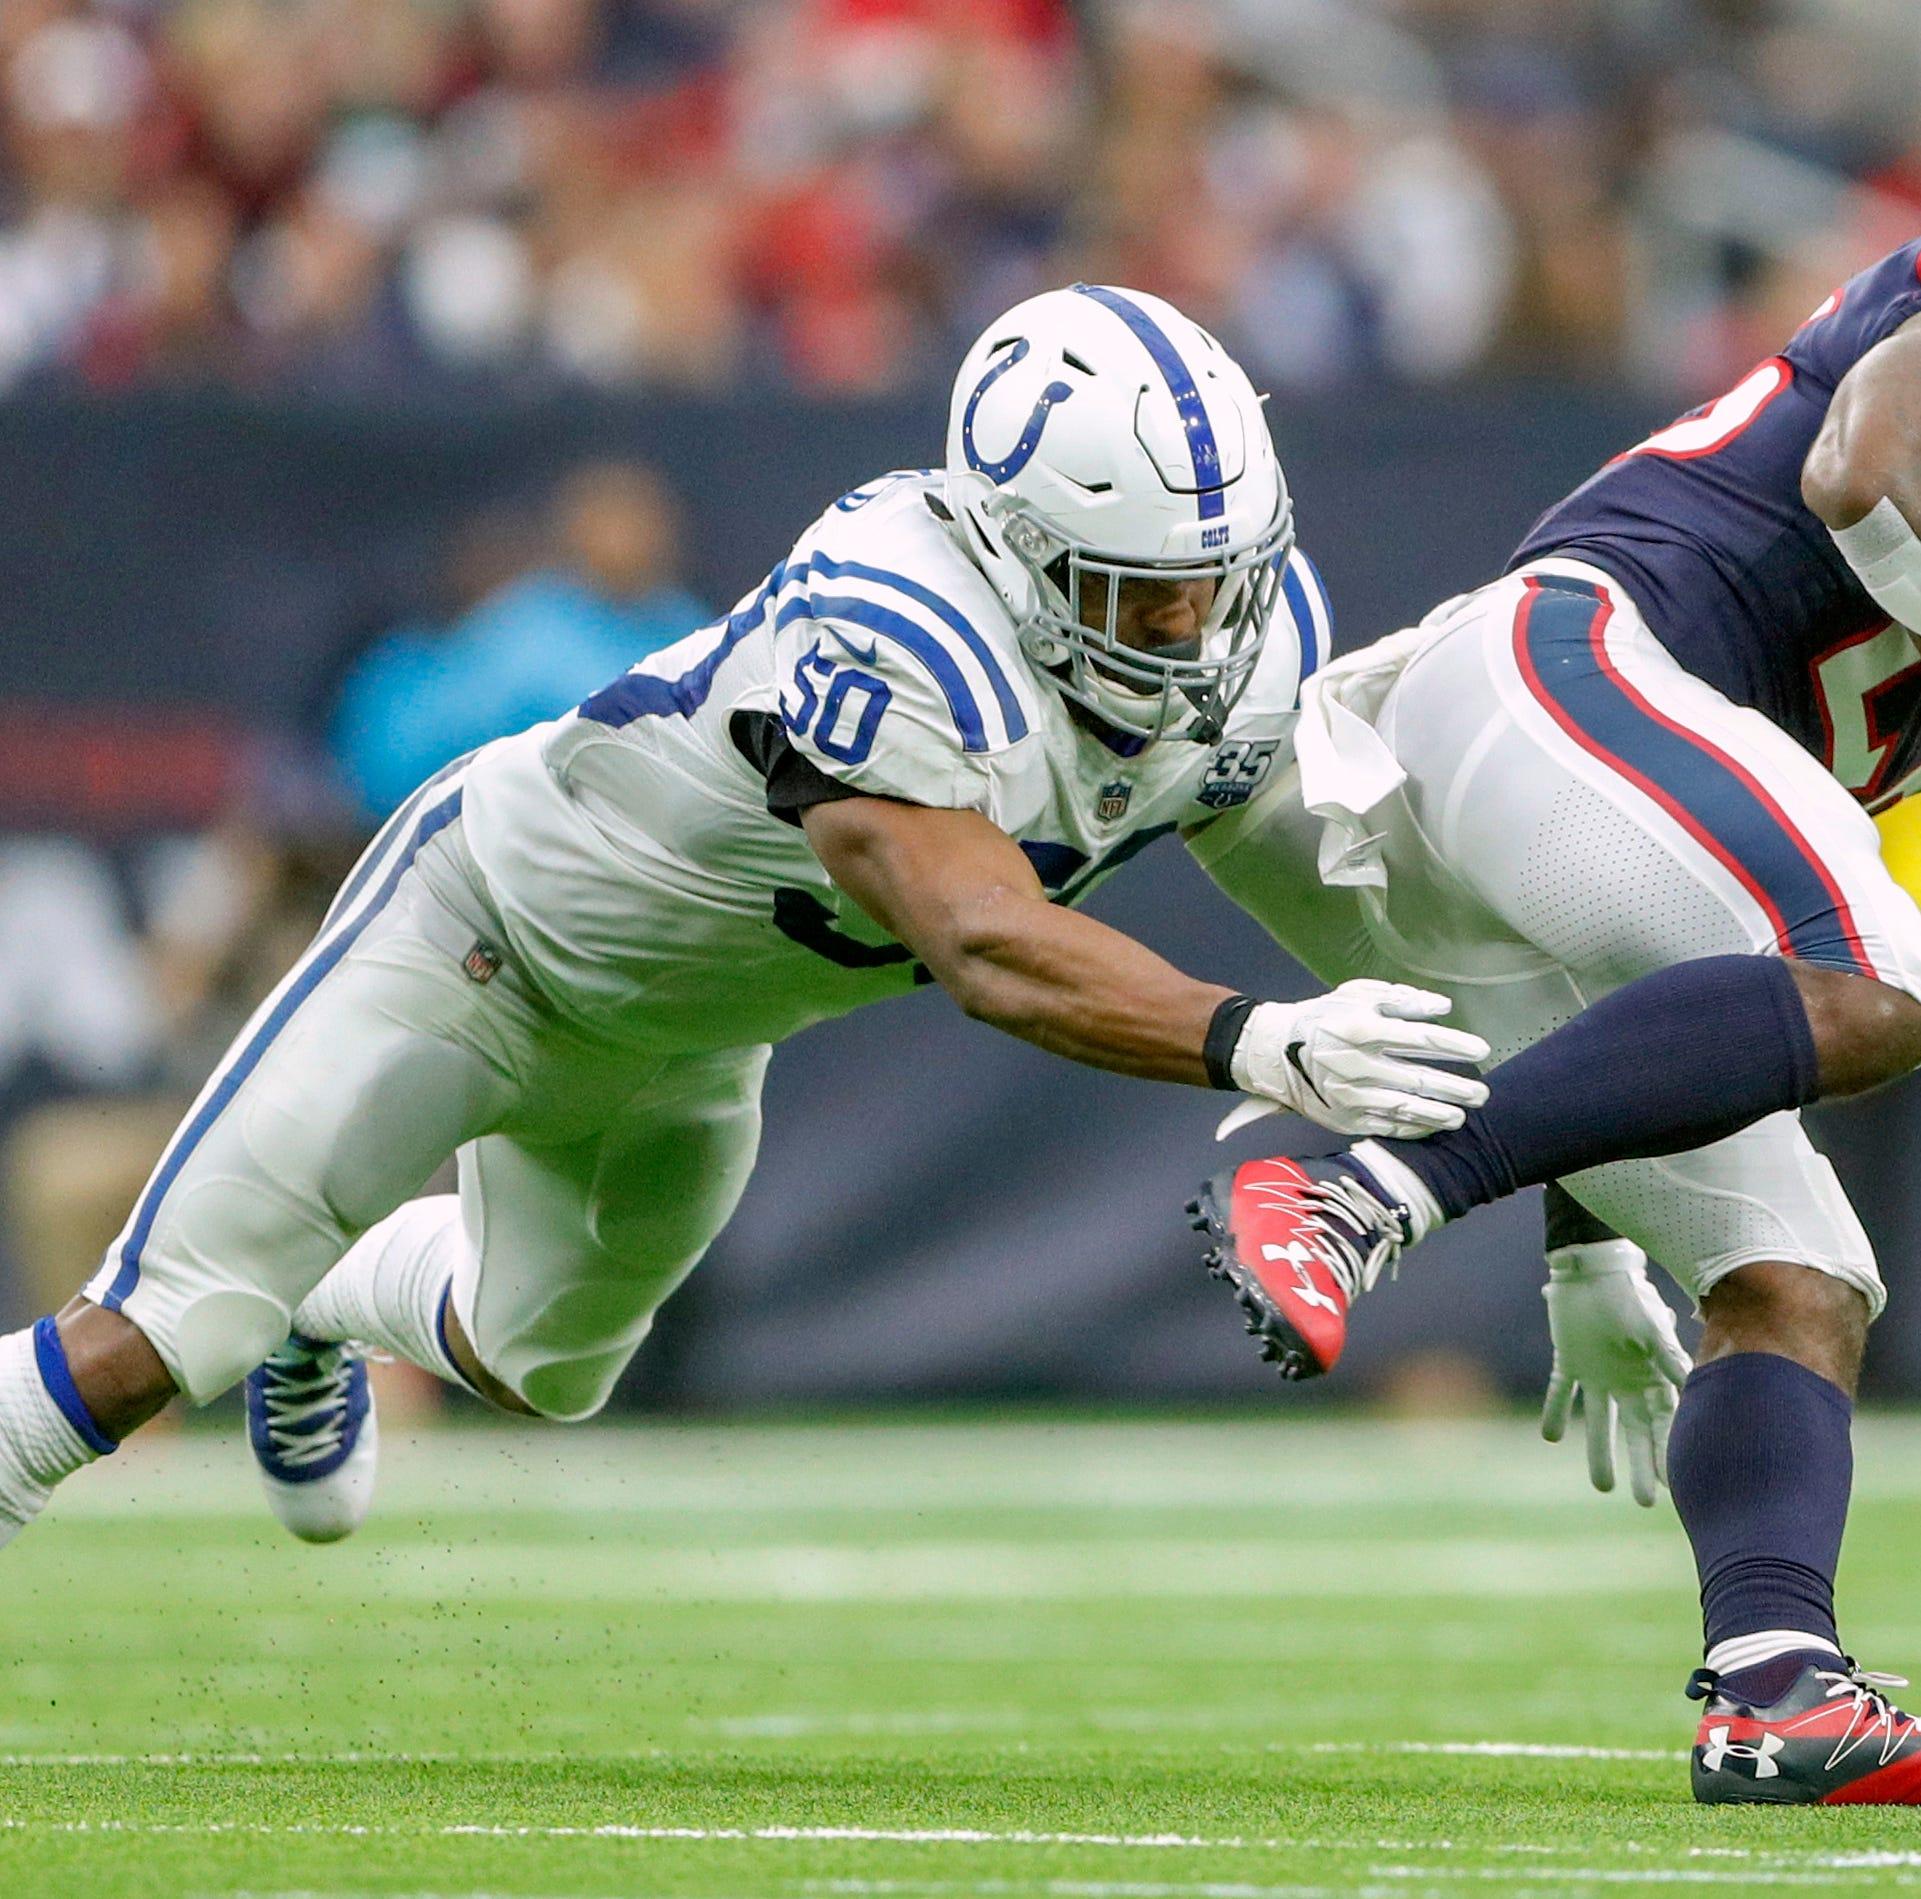 Stout Colts run defense relishes two-week test against Ezekiel Elliott, Saquon Barkley